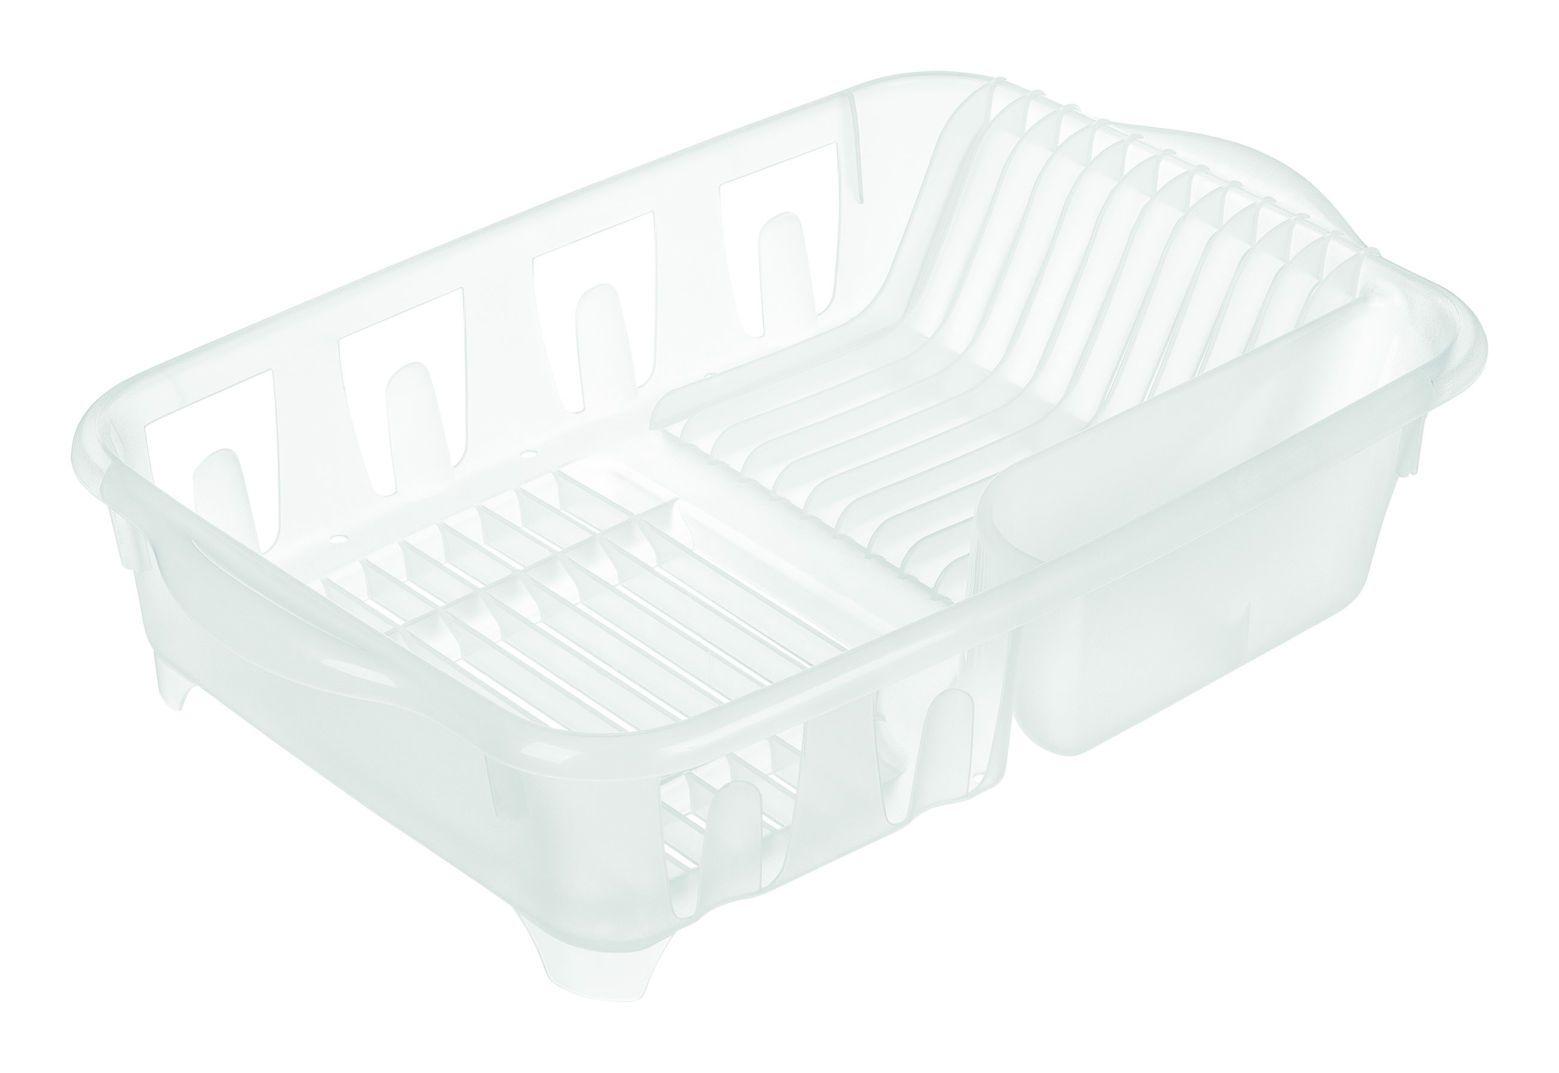 Escorredor de Louças Plástico 45,8 x 31,8 cm Casar